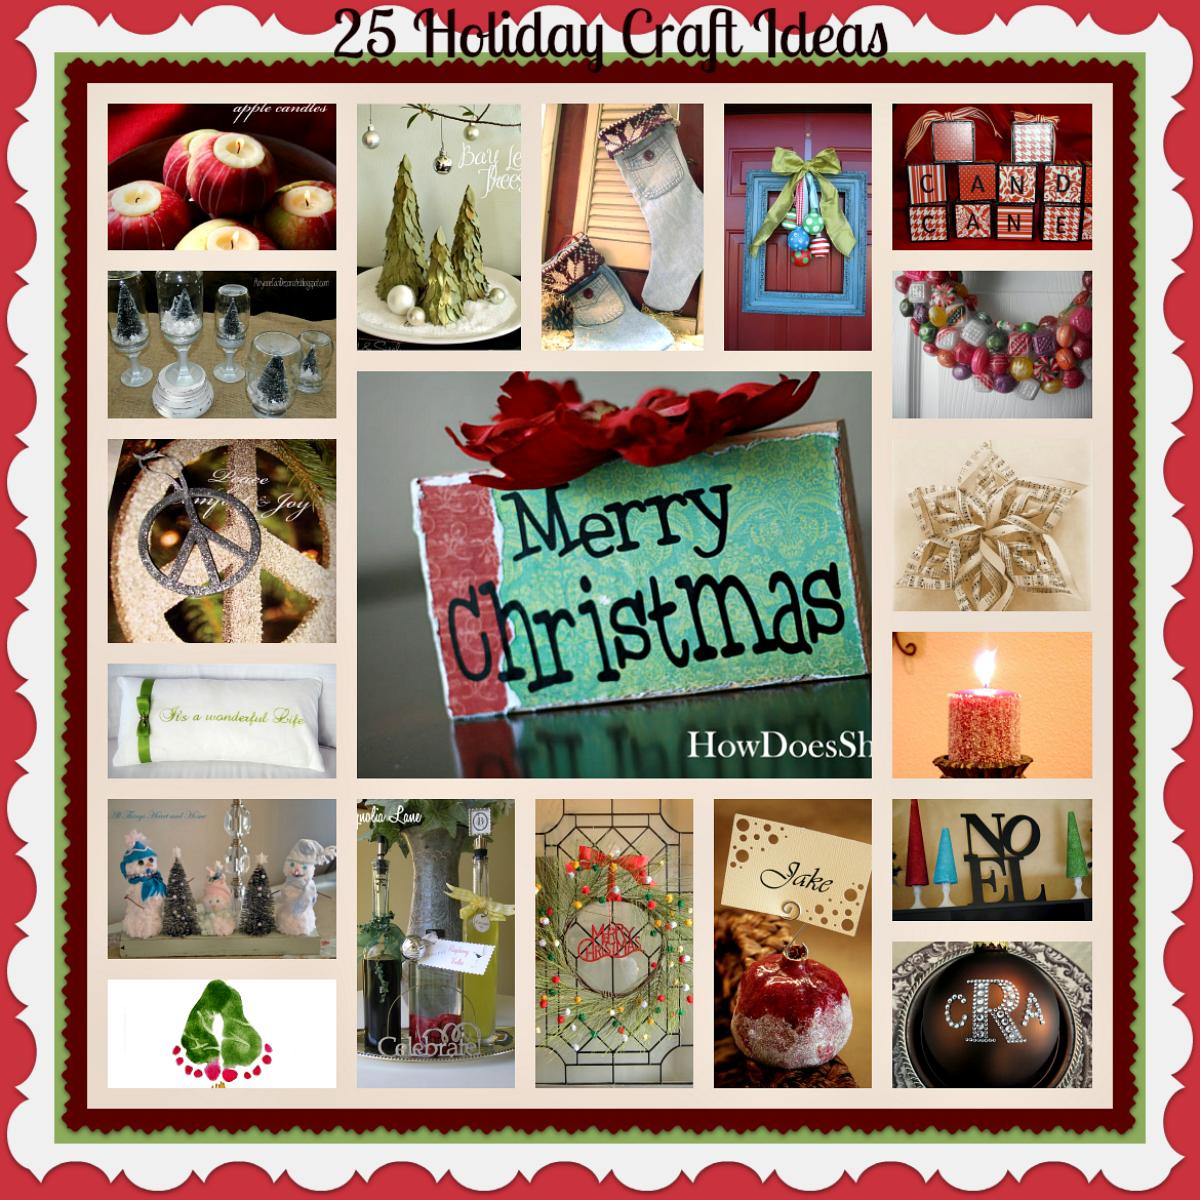 Christmas Craft Ideas Using Baby Food Jars Naturallycurlye Com